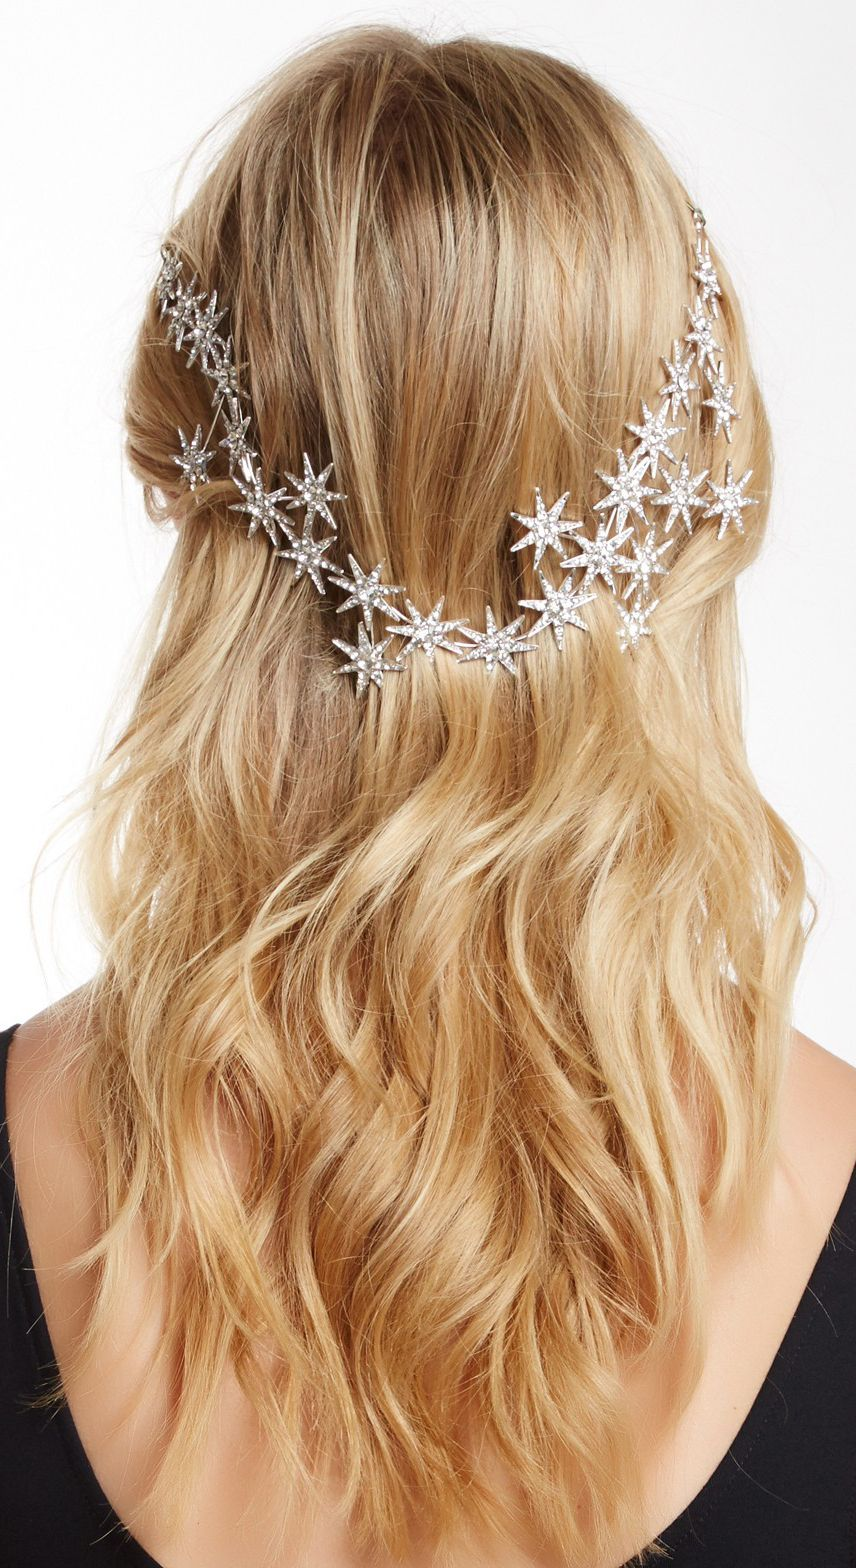 Pin On Hair Hair Accessories I Like